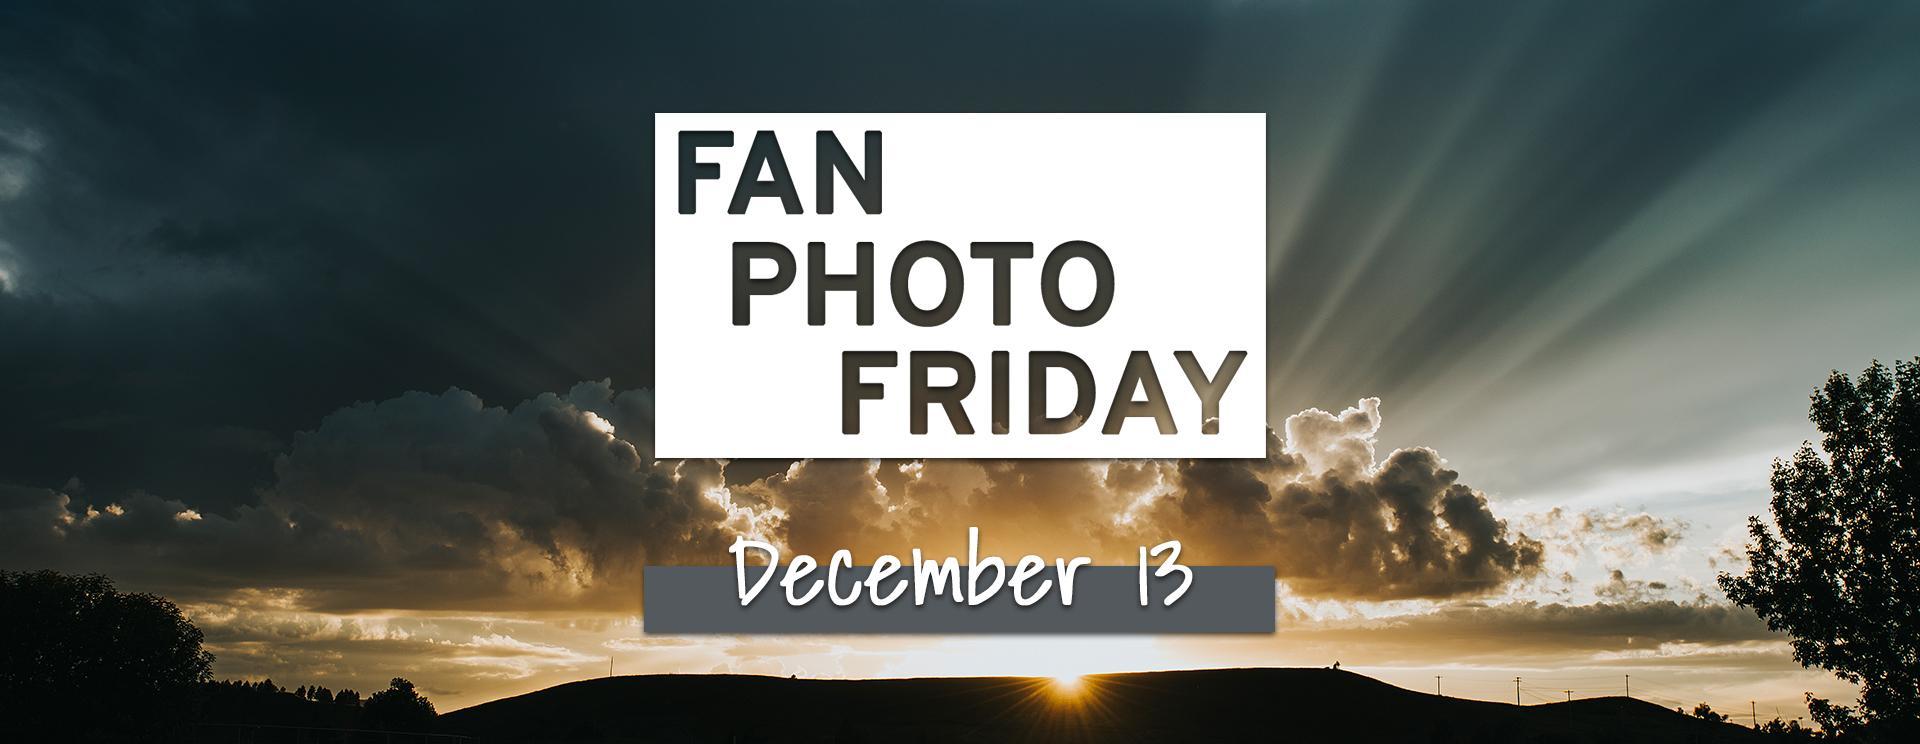 Fan Photo Friday | Dec. 13, 2019